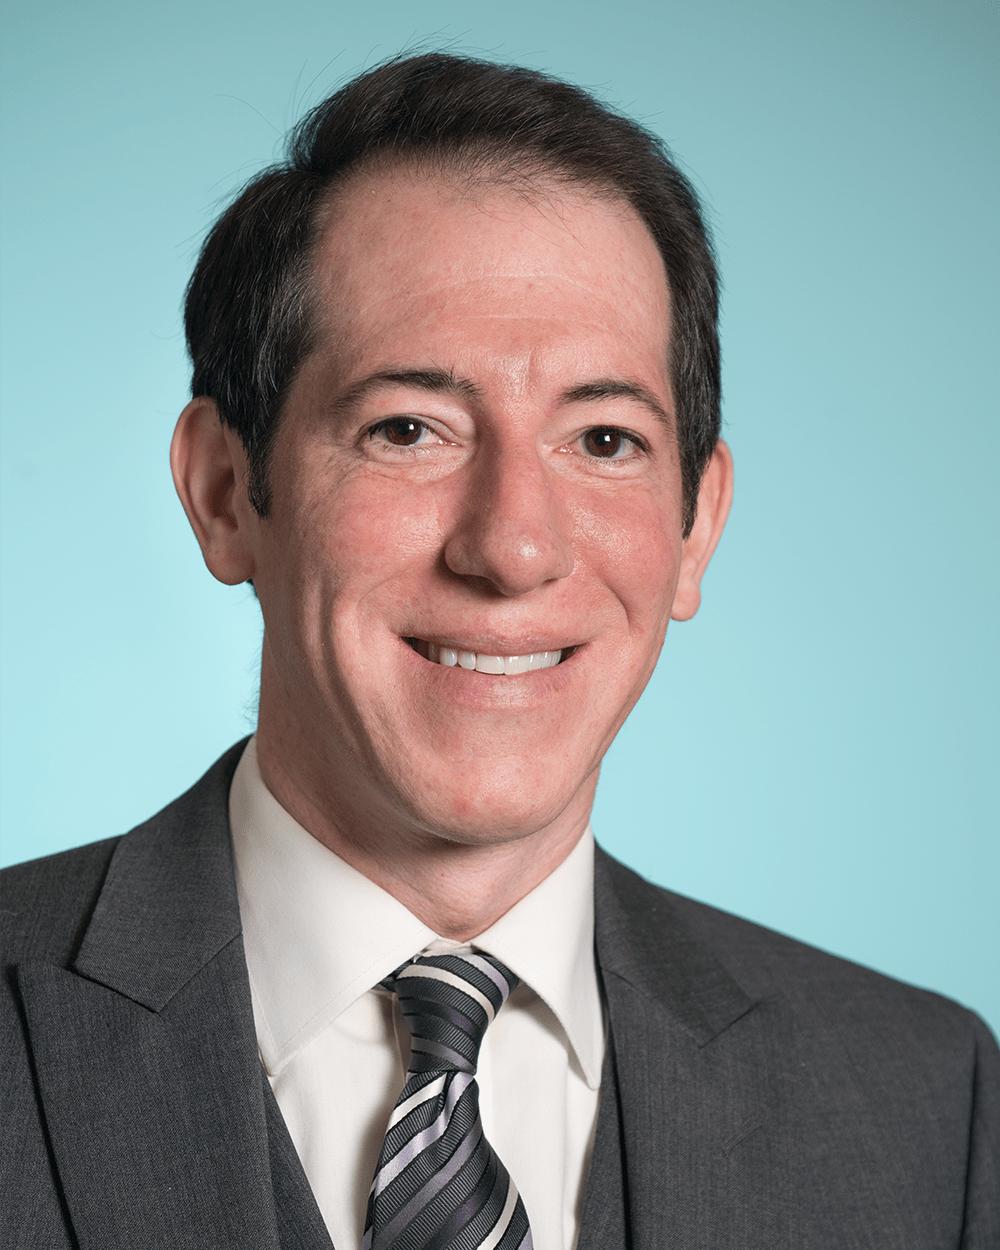 Dr. Jeremy Peterman